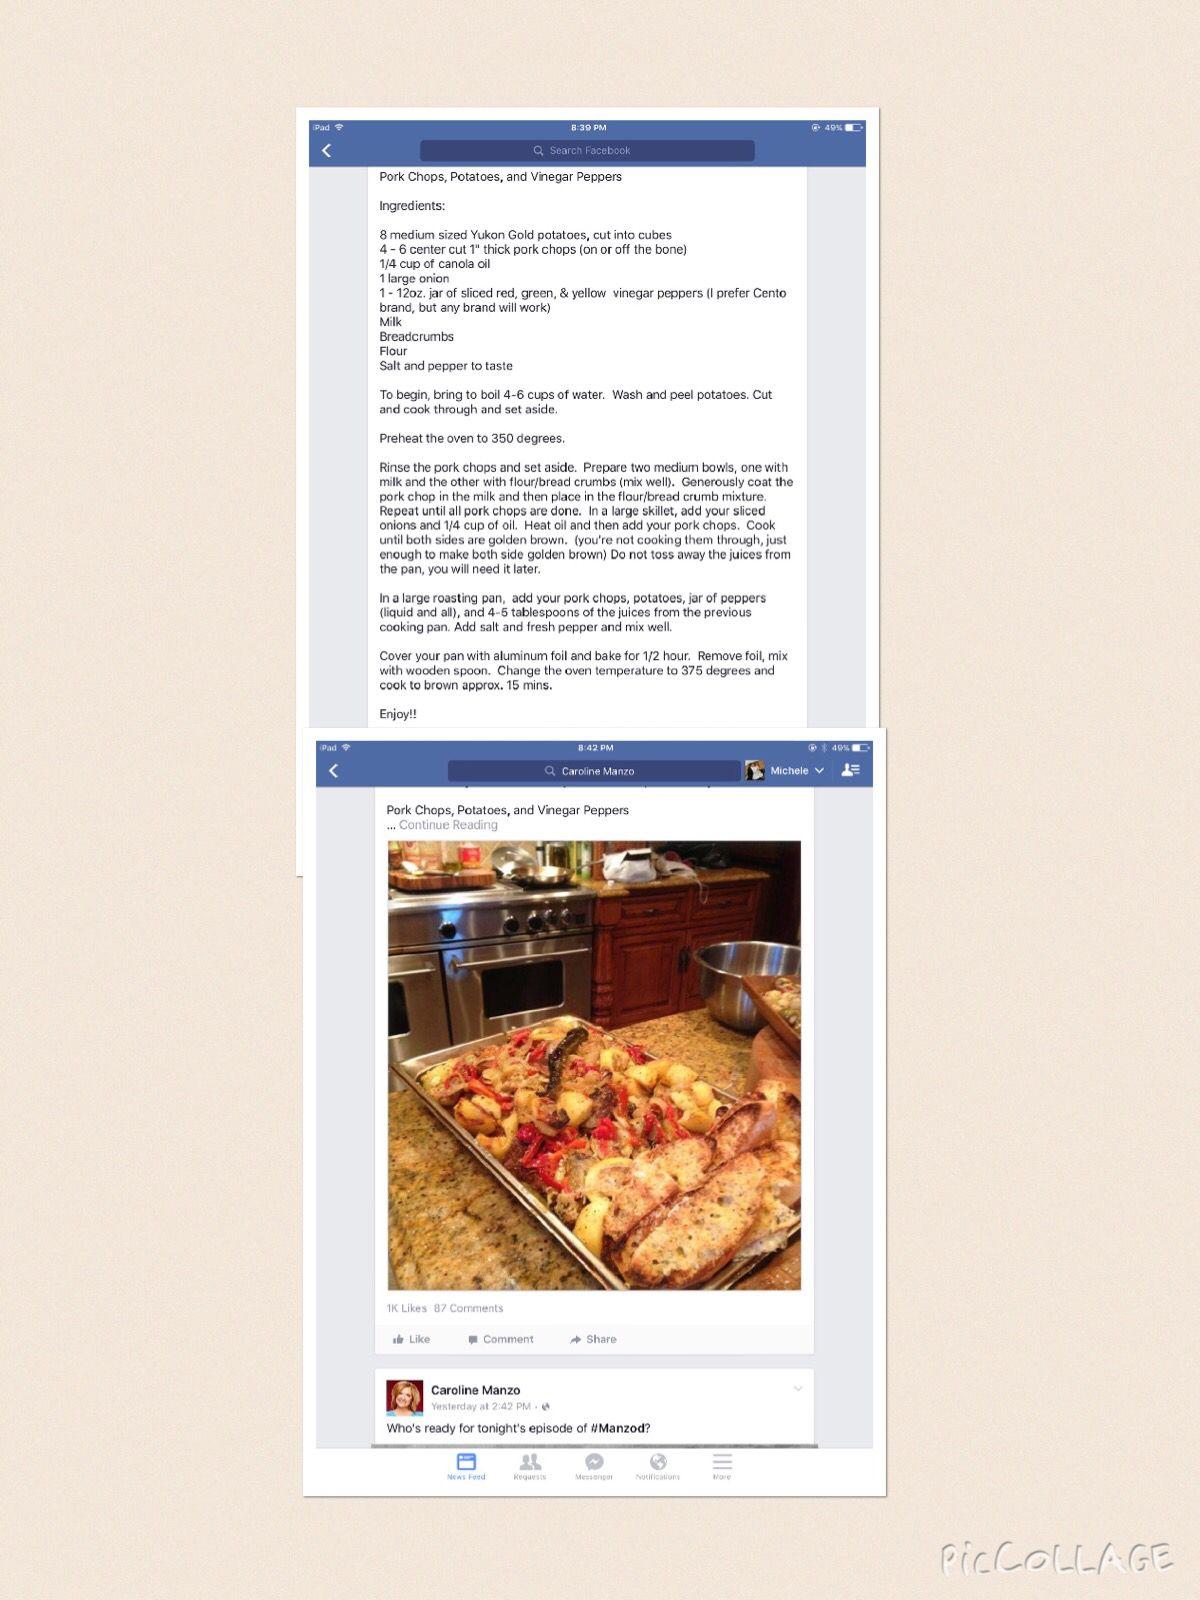 Caroline Manzo's Pork Chops, Potatoes, And Vinegar Peppers